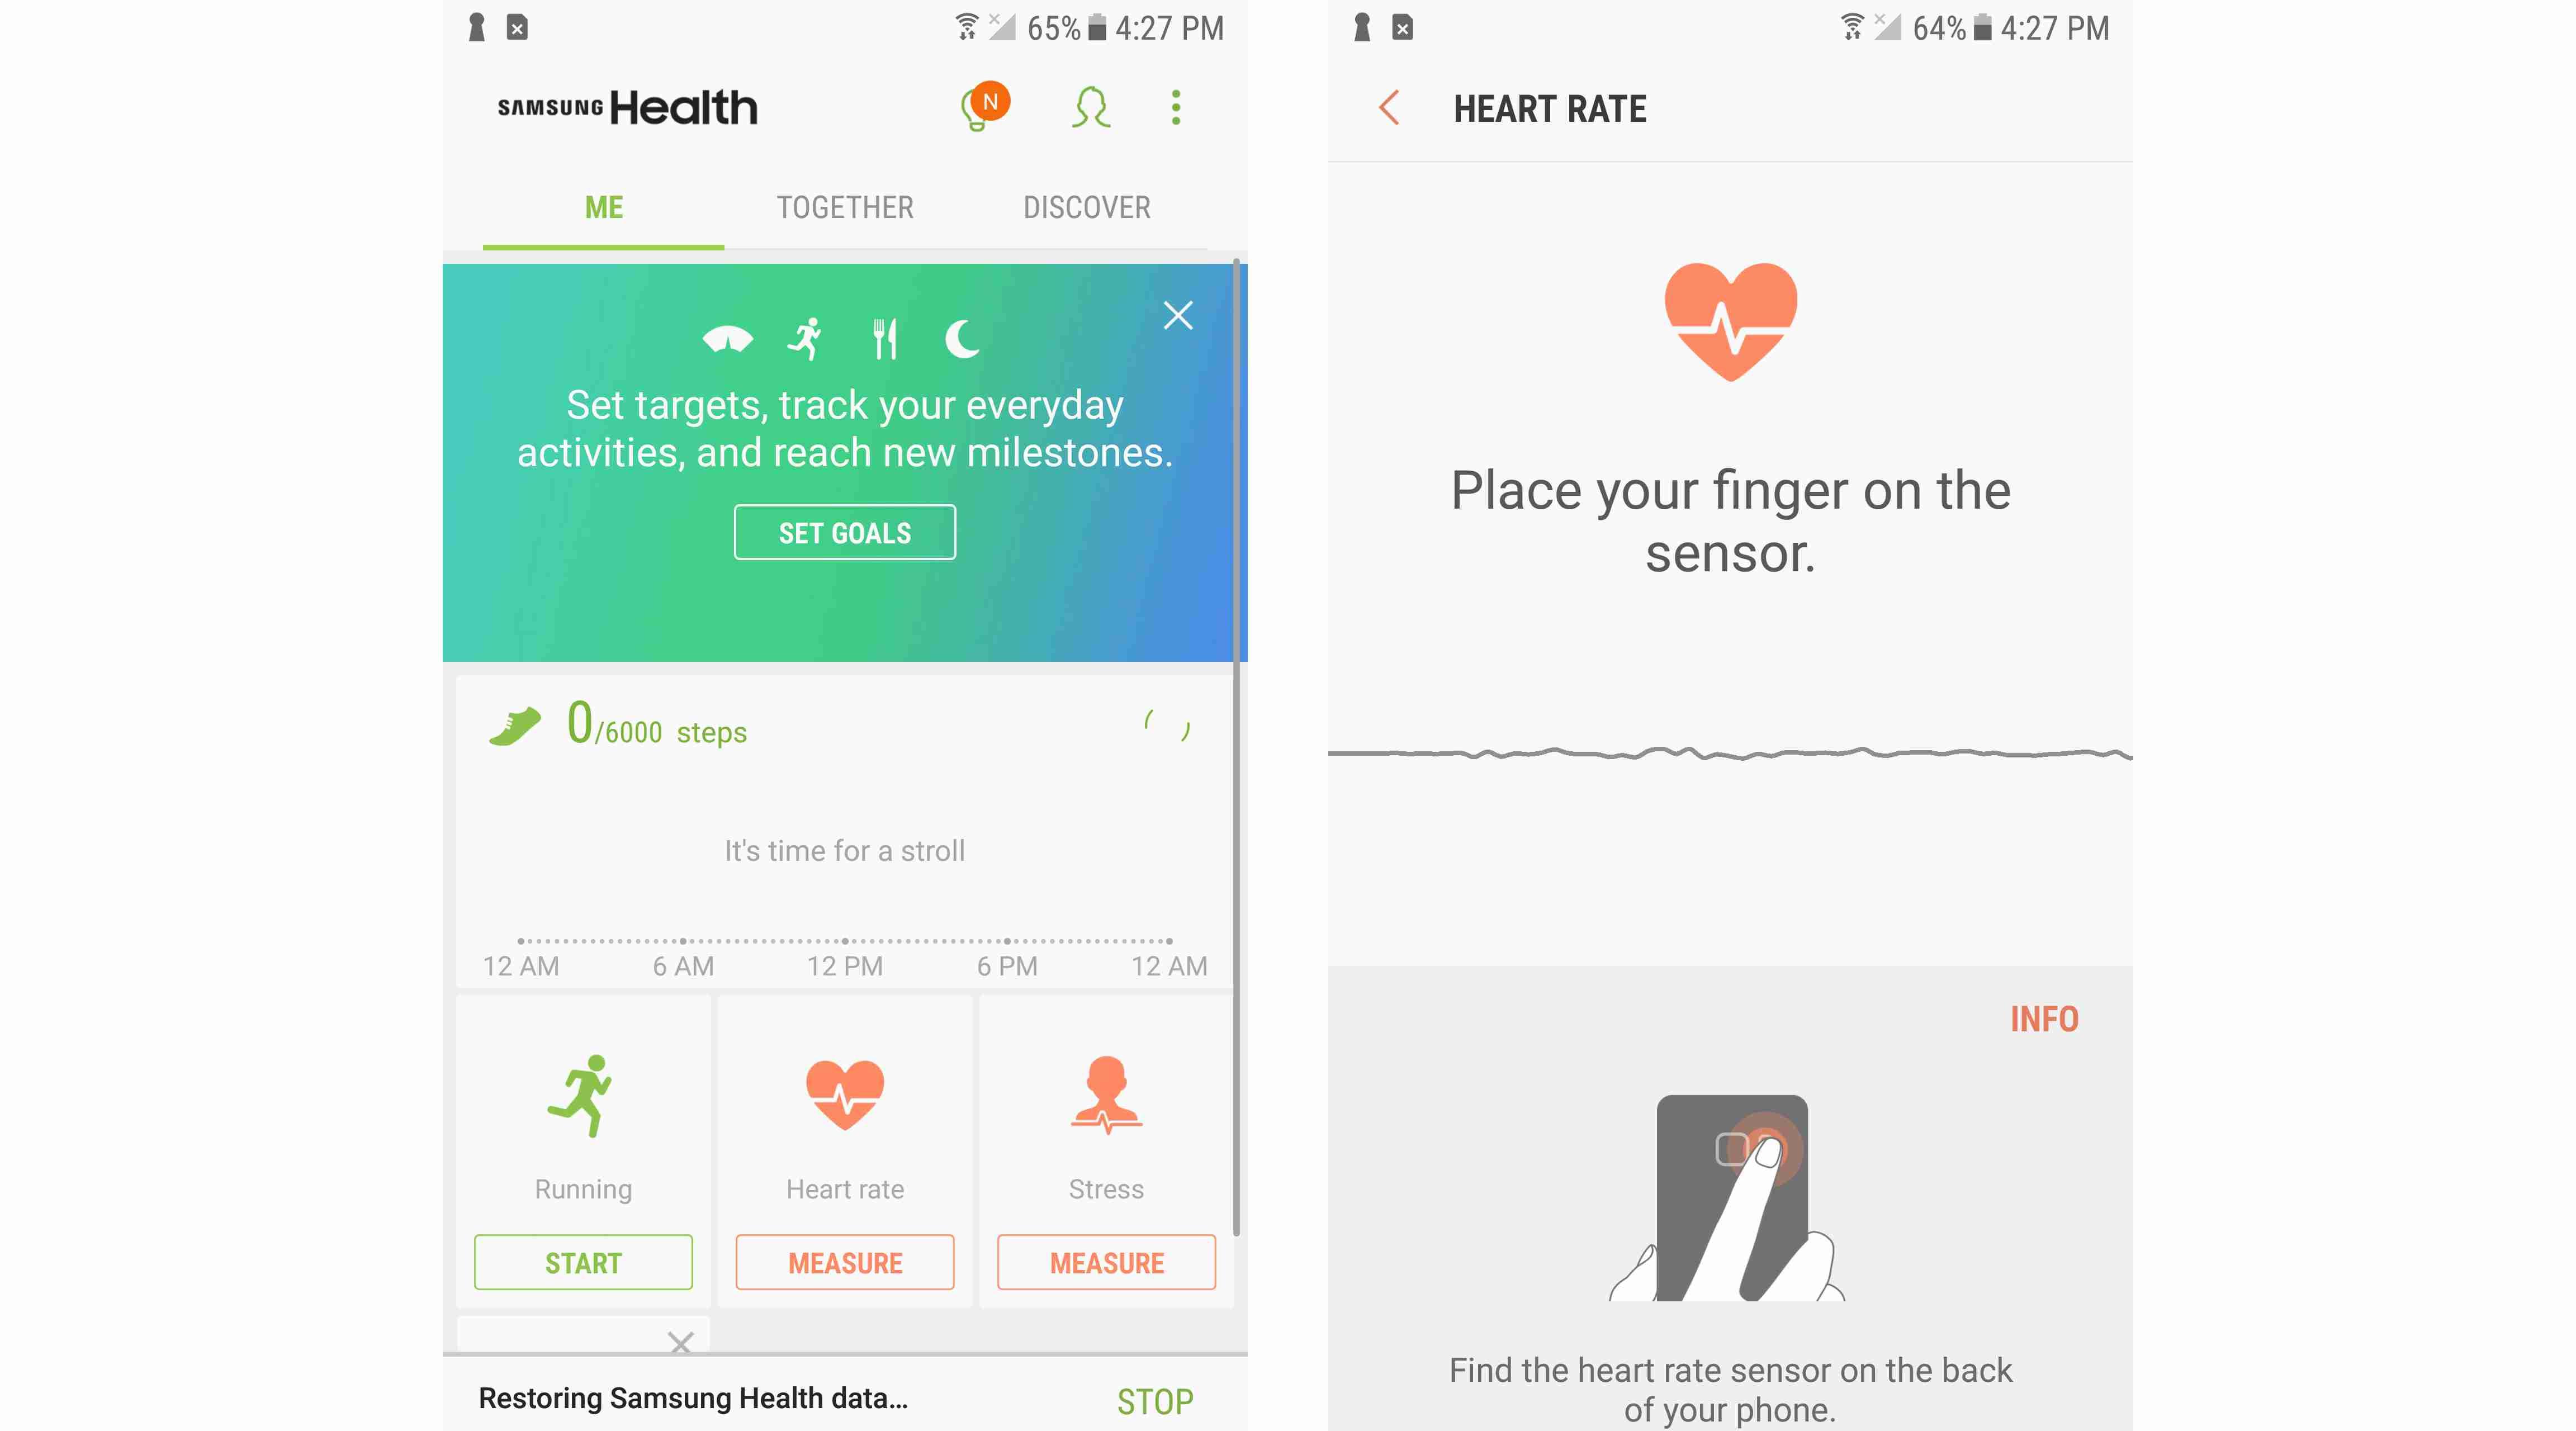 Screenshots of Samsung Health app